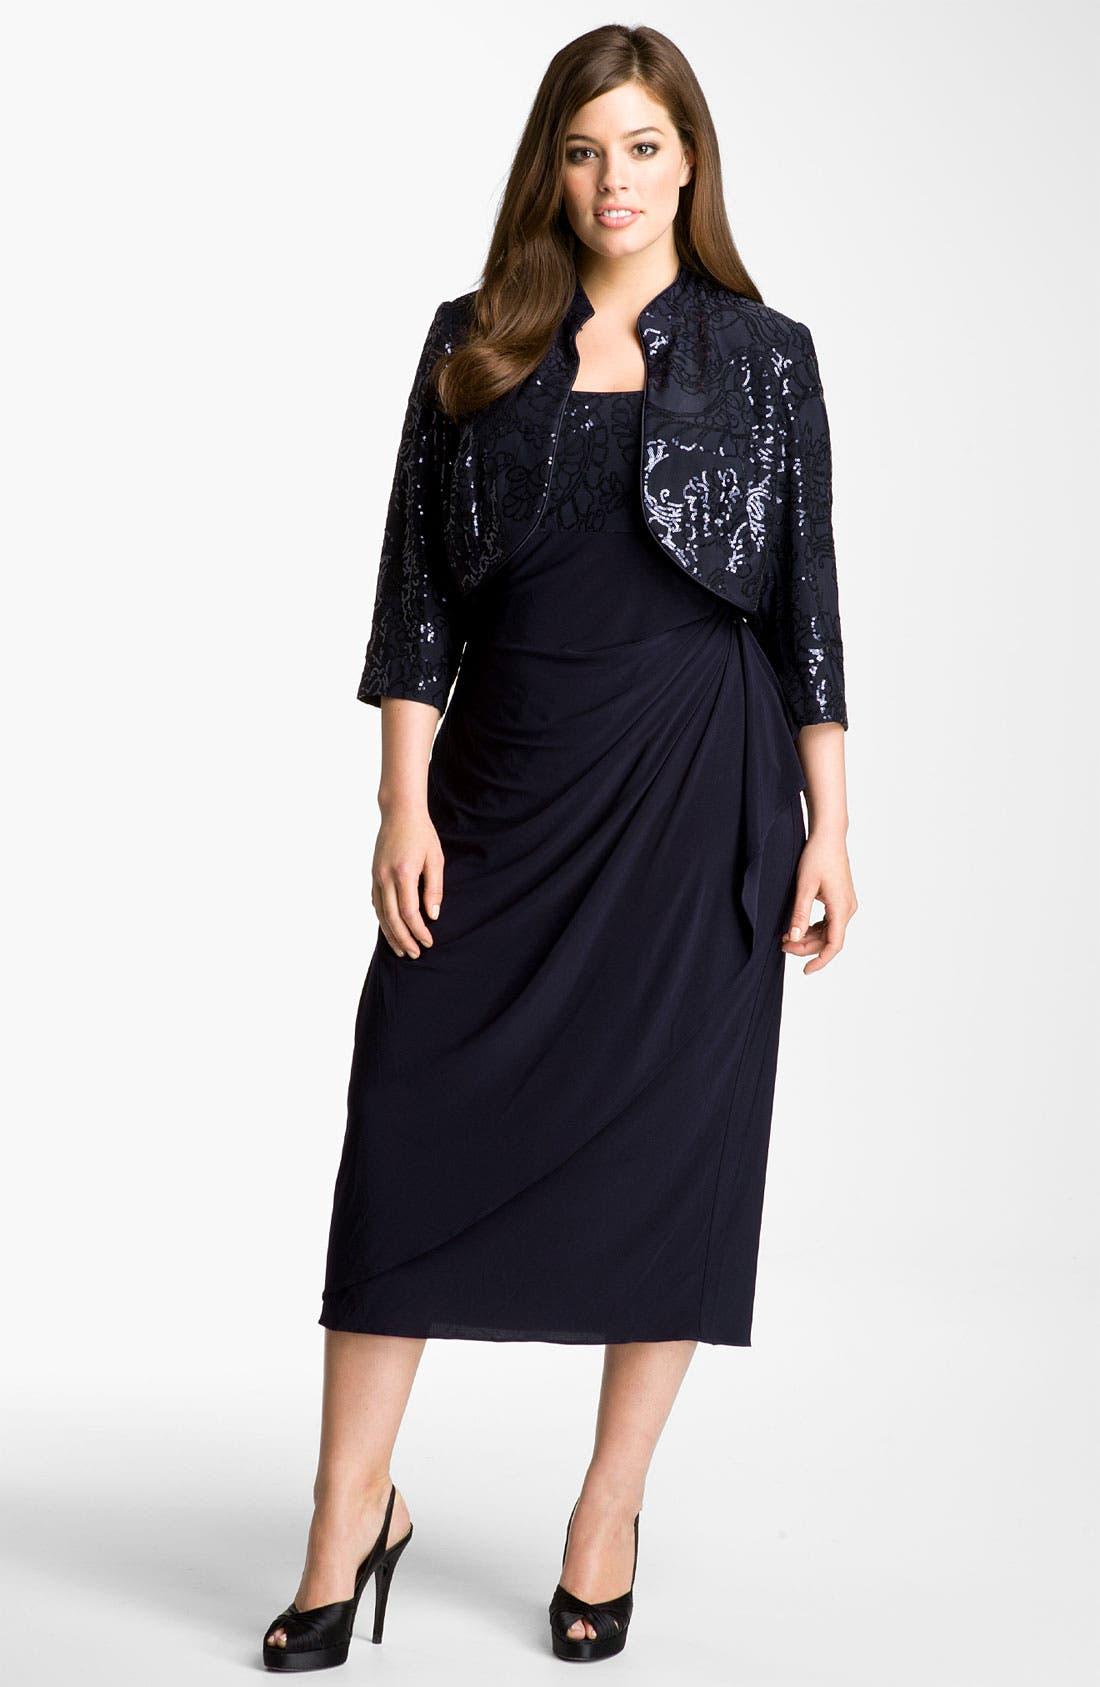 Alternate Image 1 Selected - Alex Evenings Gathered Dress & Jacket (Plus Size)